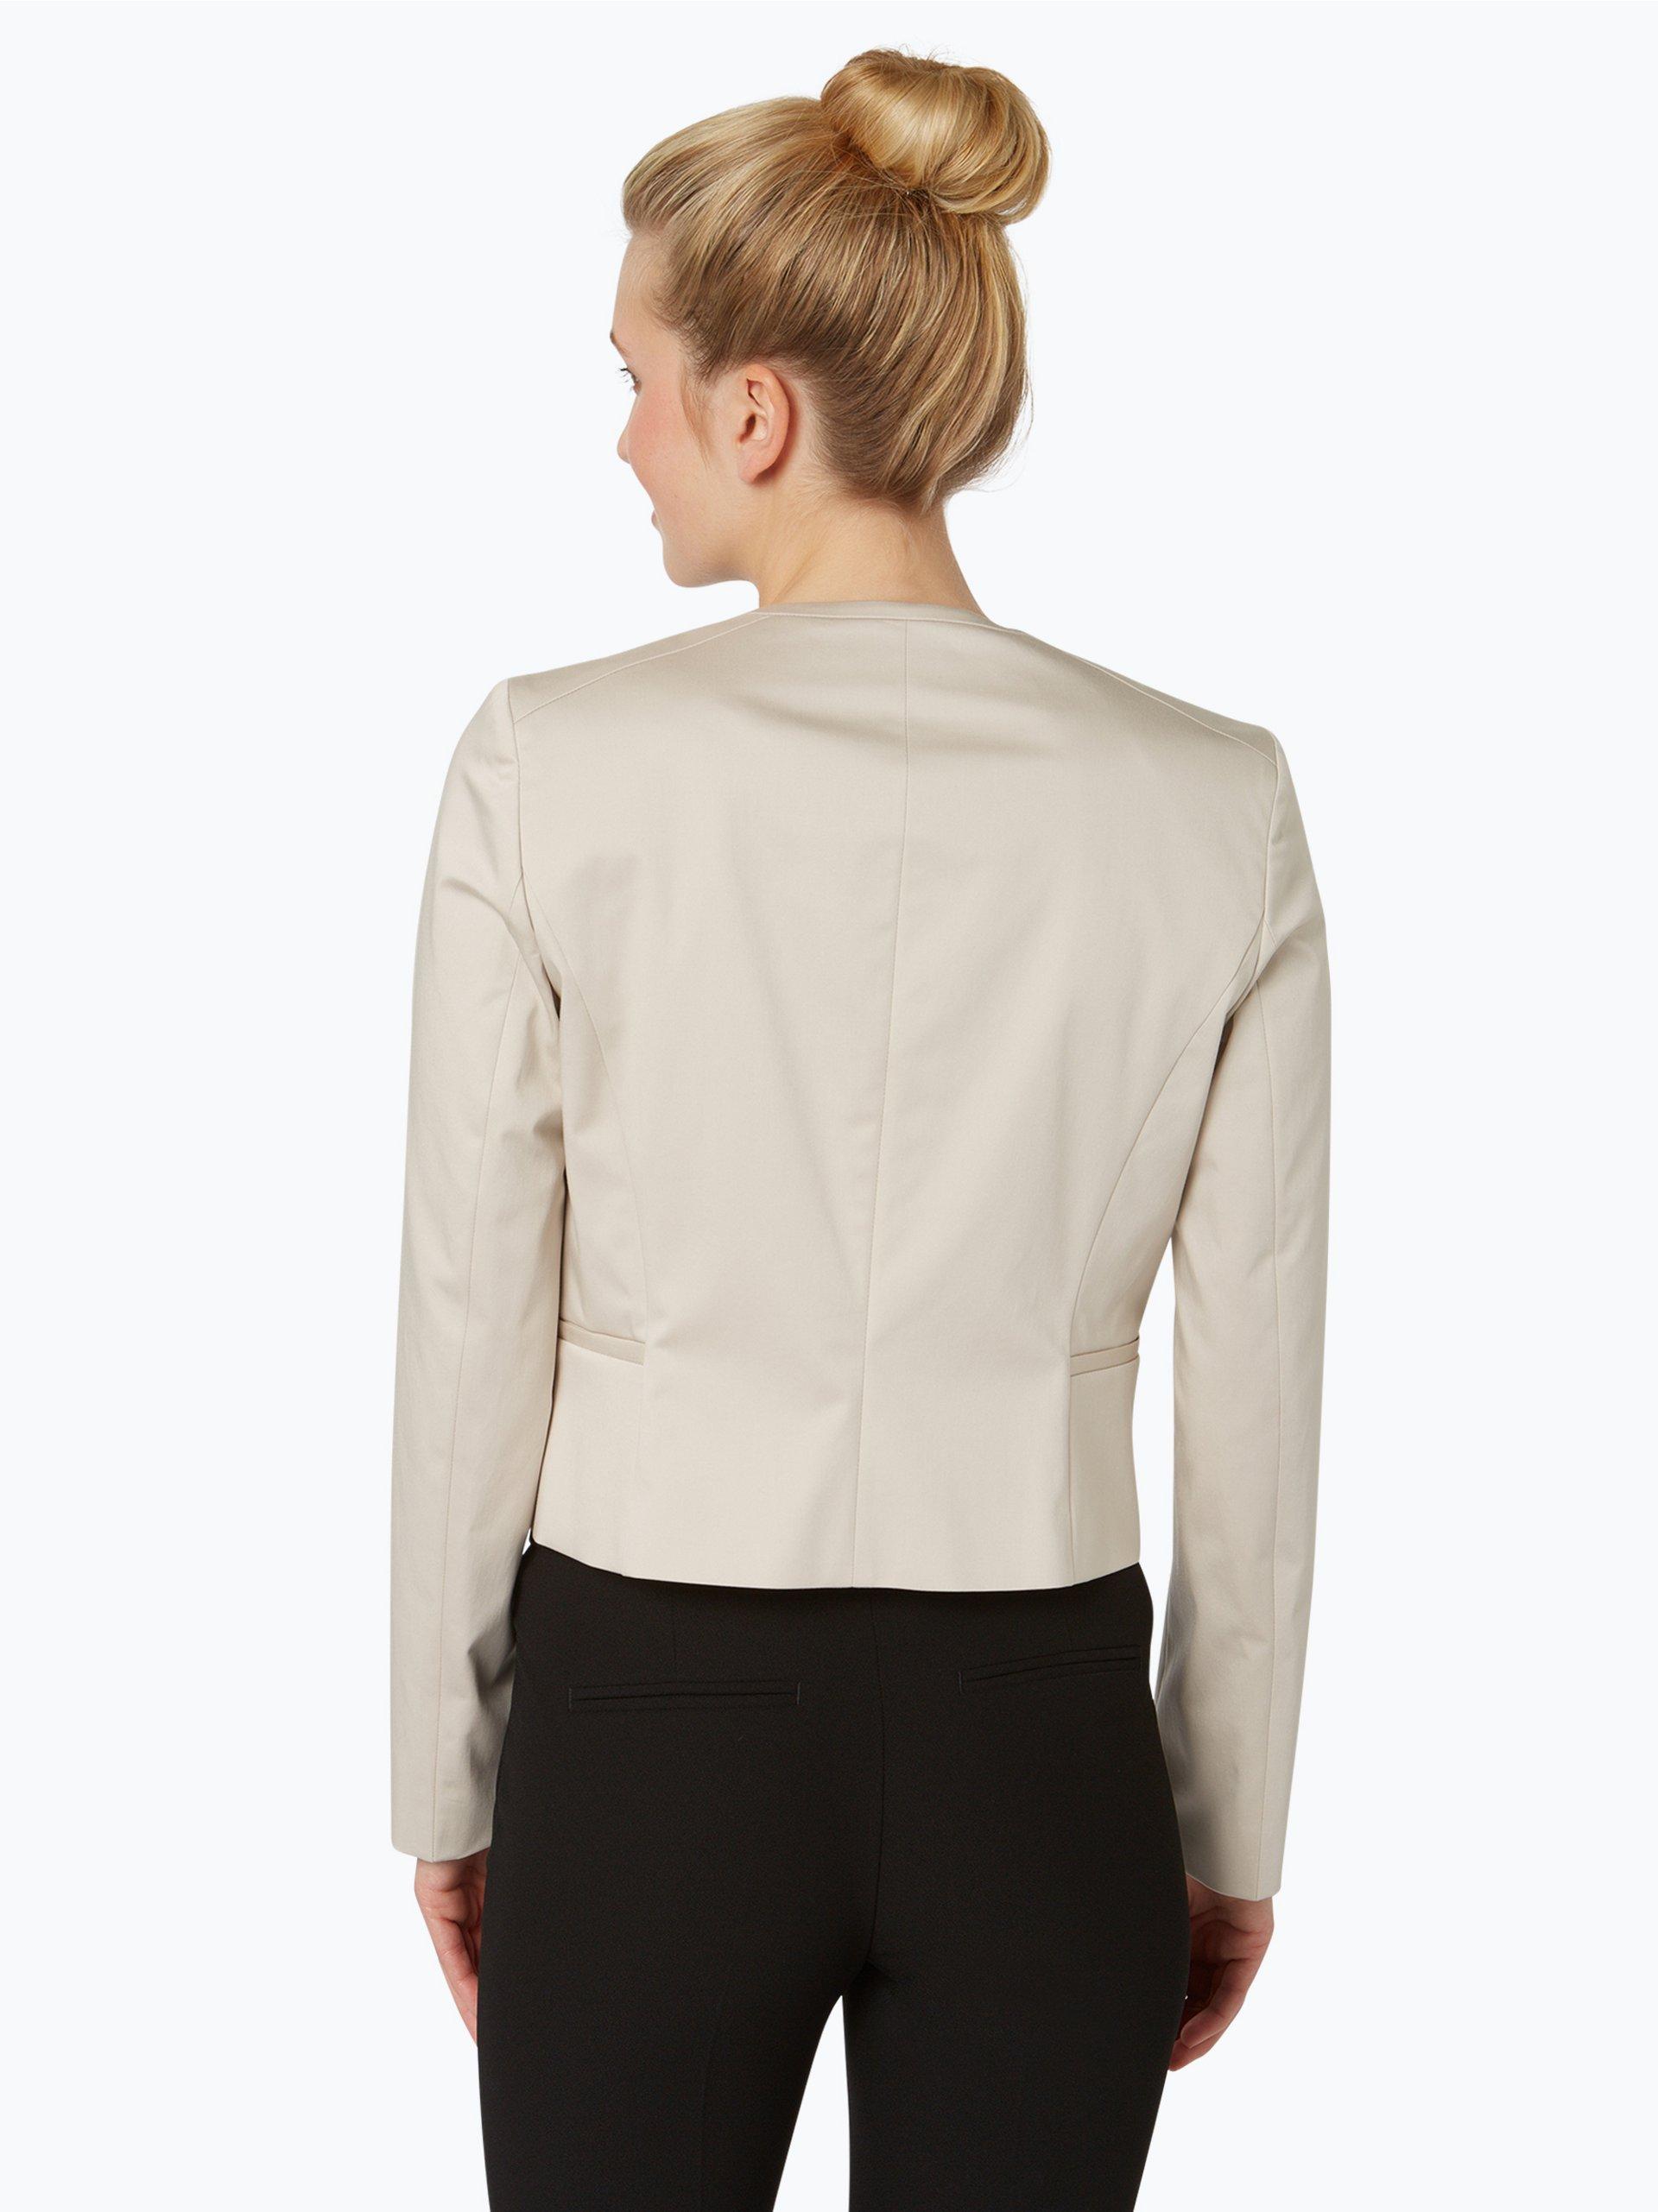 boss damen blazer jelanea beige uni online kaufen vangraaf com. Black Bedroom Furniture Sets. Home Design Ideas